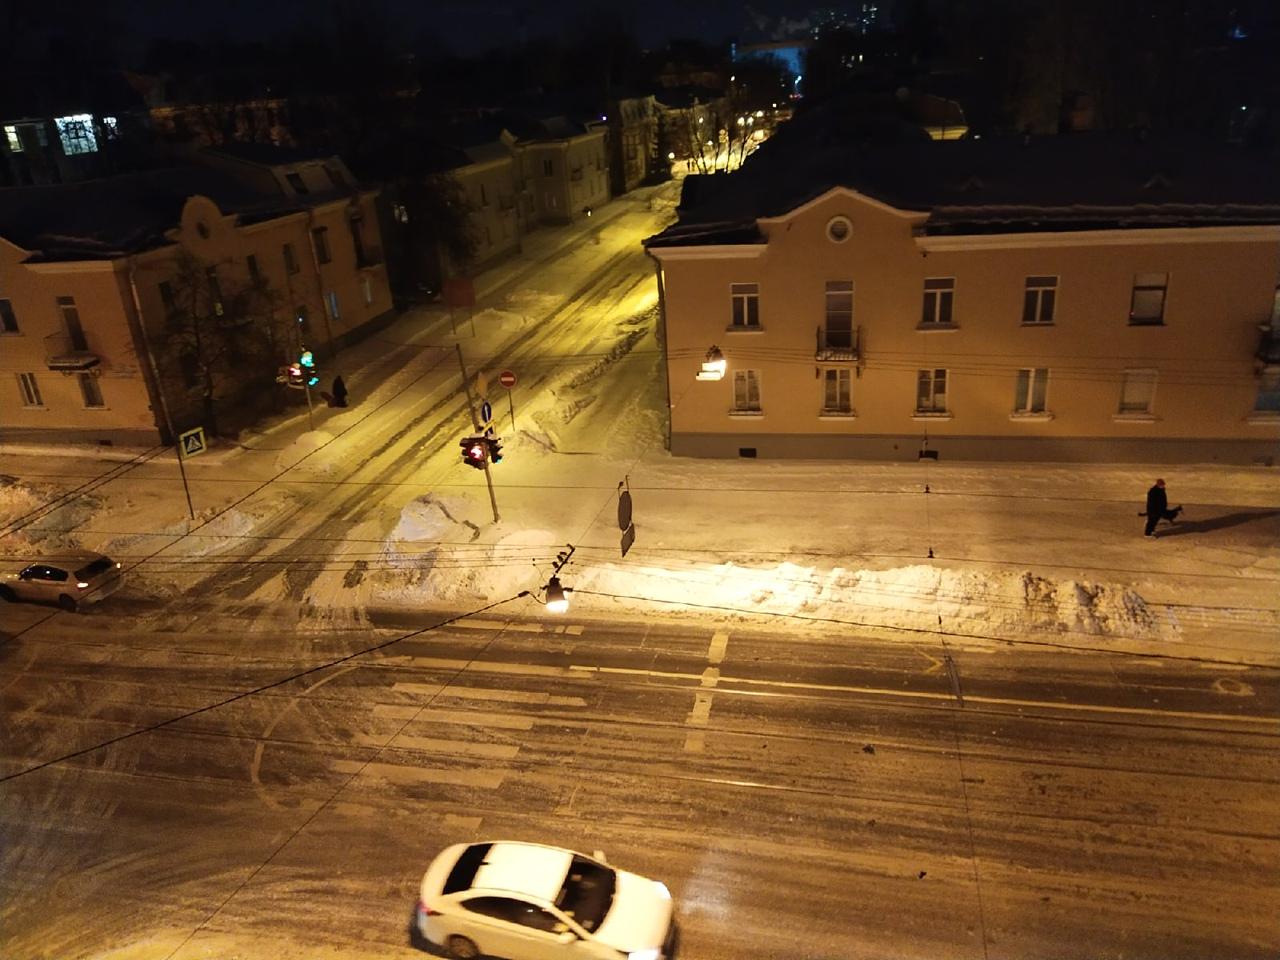 Машина сбила пешехода на пересечении Савушкина и Оскаленко...